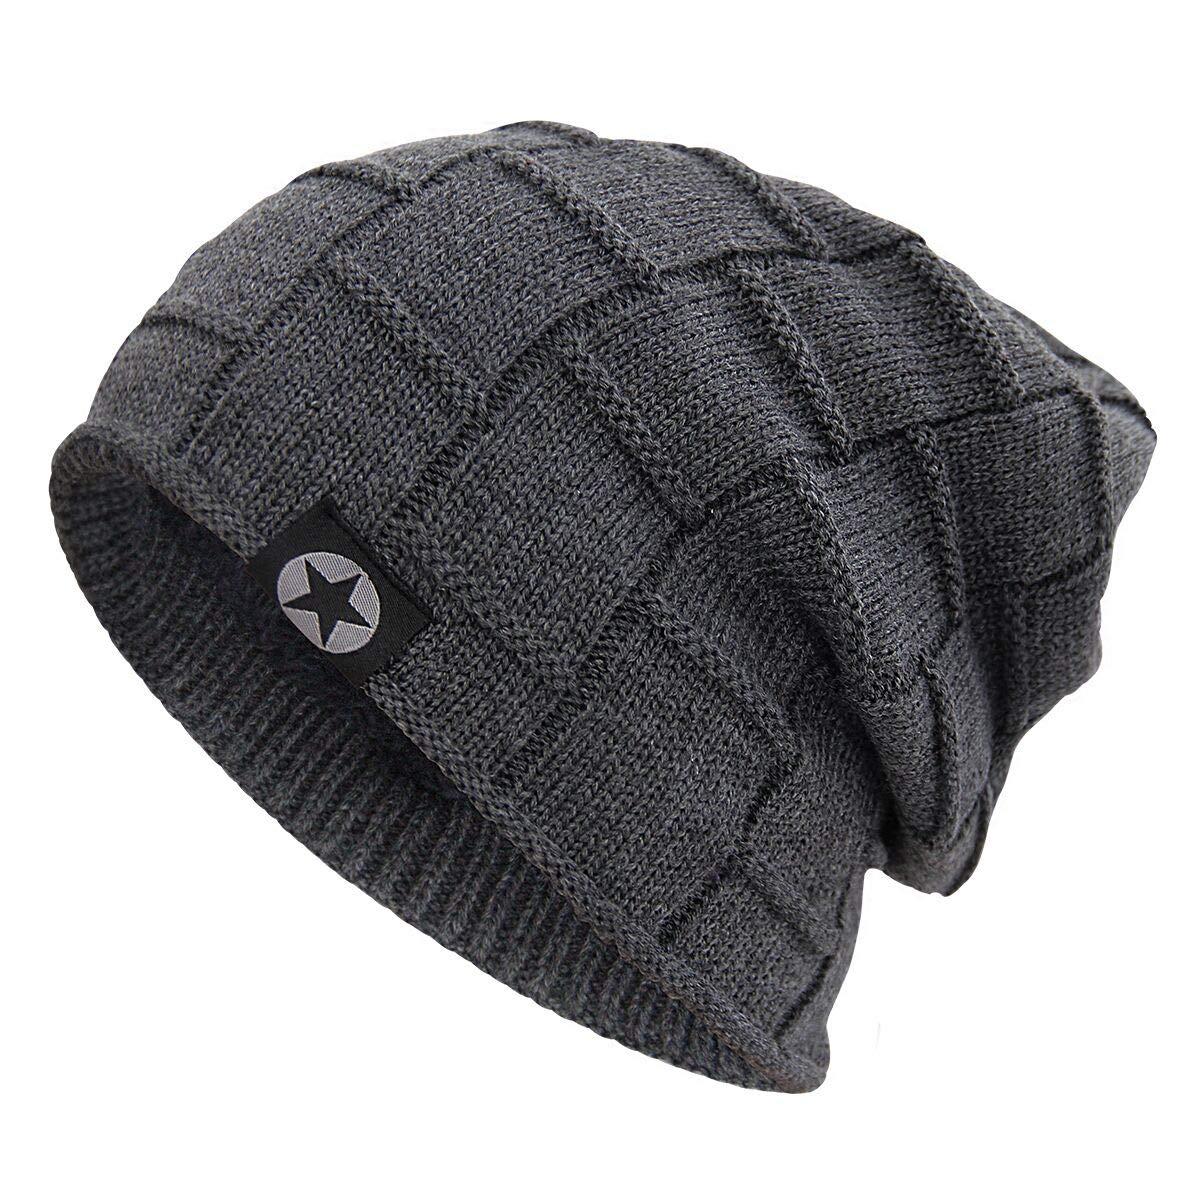 6460b93a6 Bodvera Winter Knit Warm Hat Thick Soft Fleeced Slouchy Beanie Ski ...